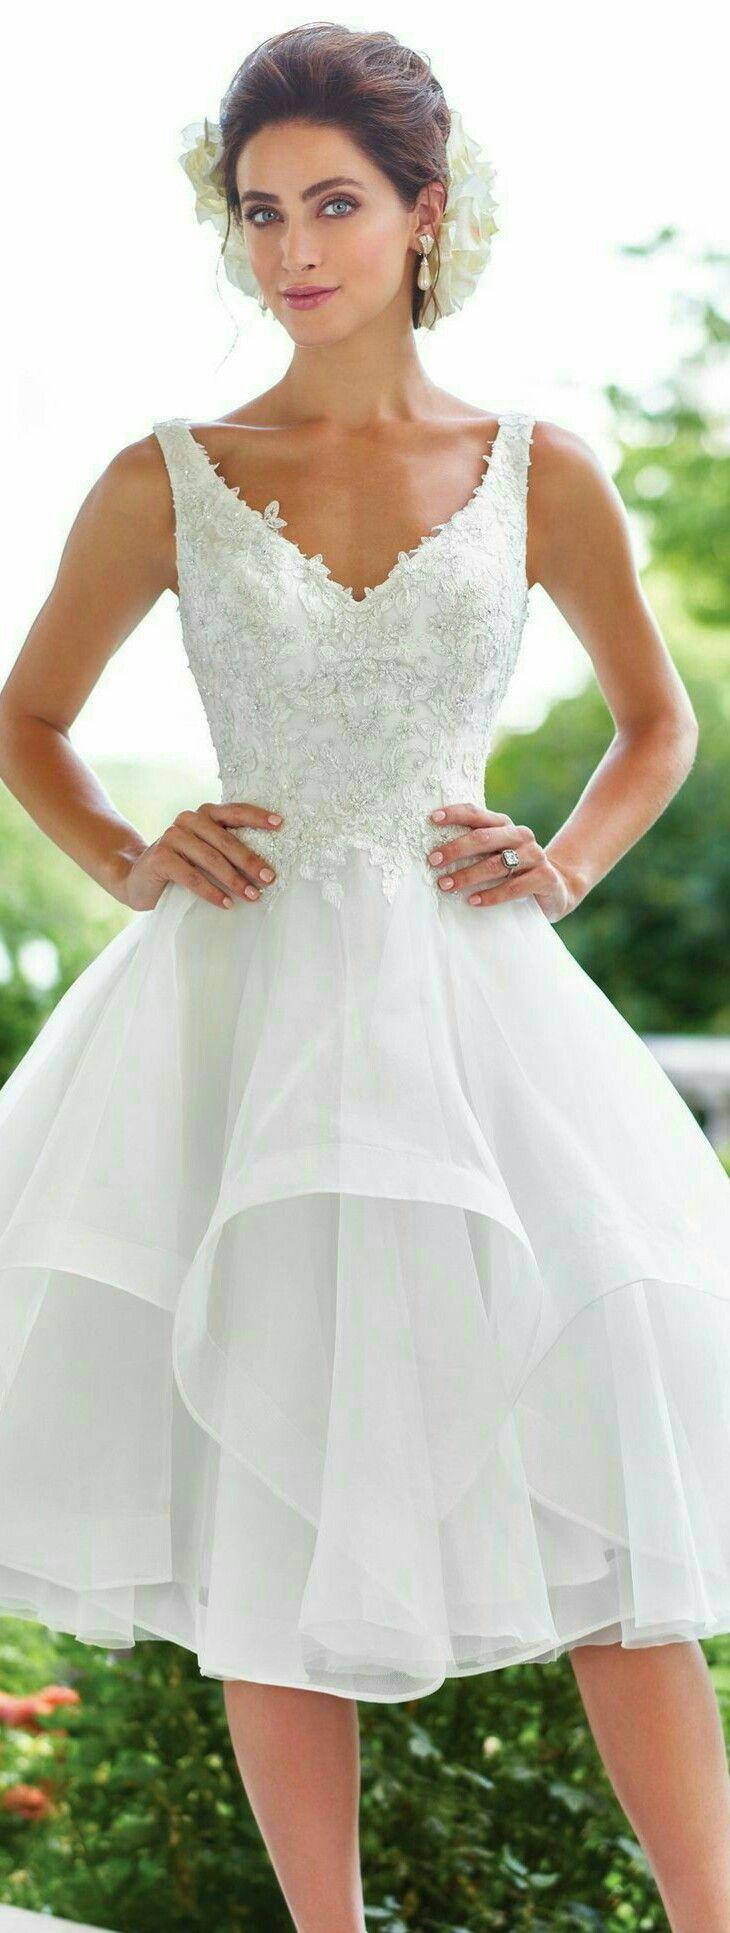 Pin by shanna bird on omg in pinterest short wedding